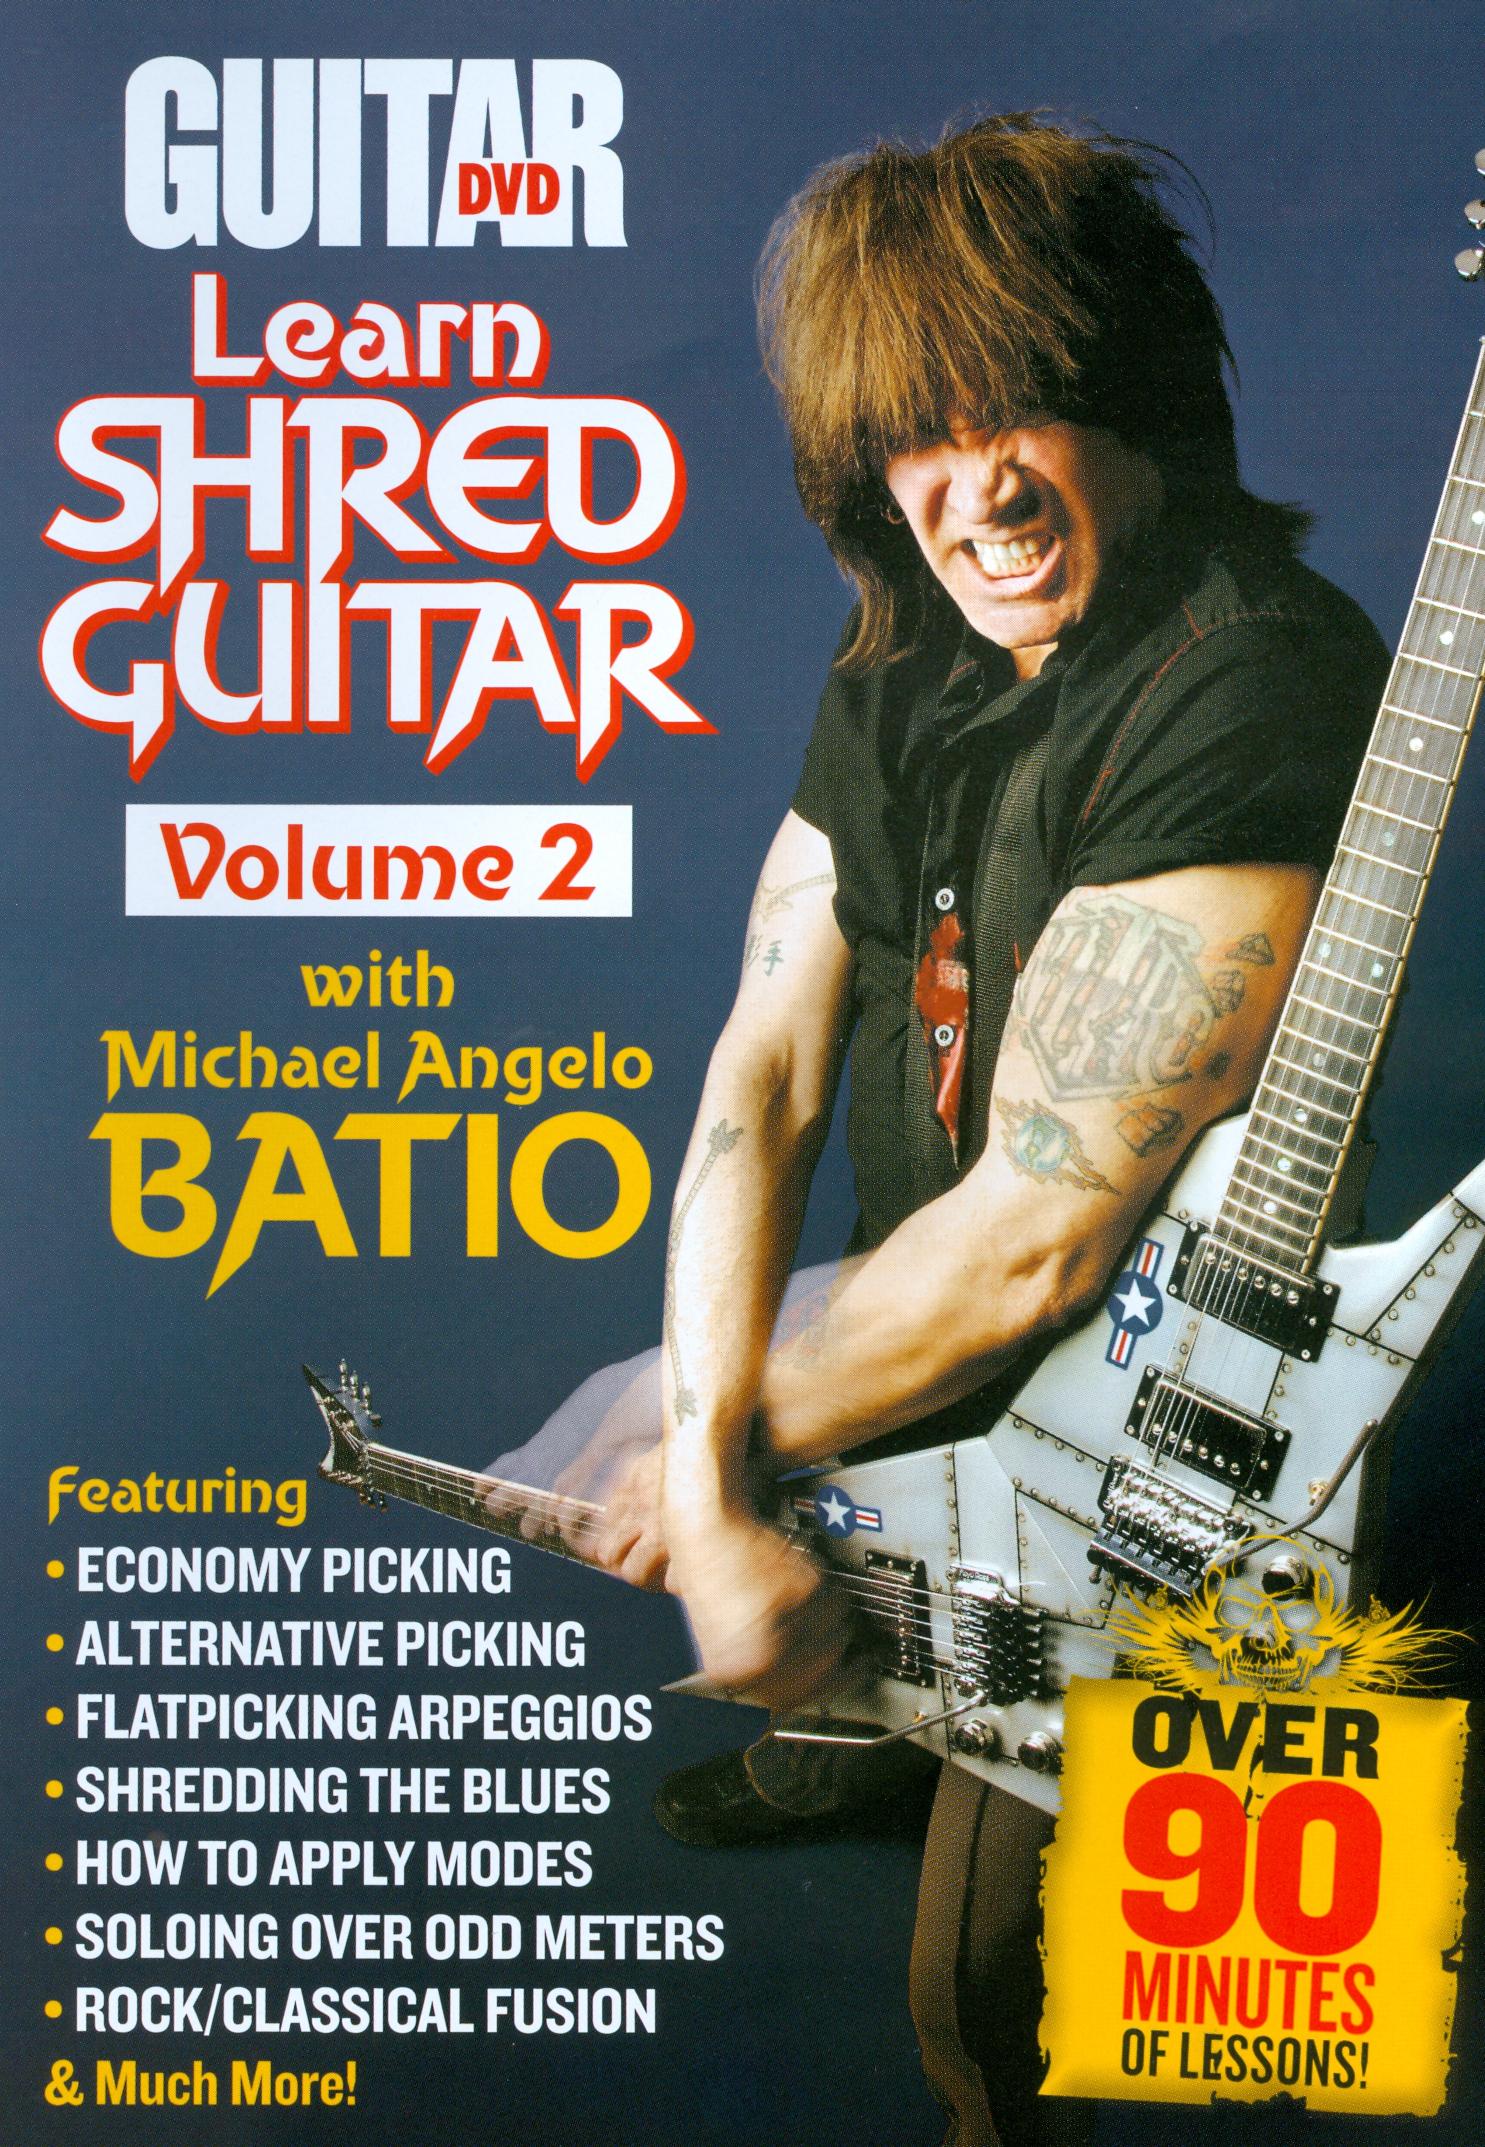 Guitar World: Learn Shred Guitar, Vol. 2